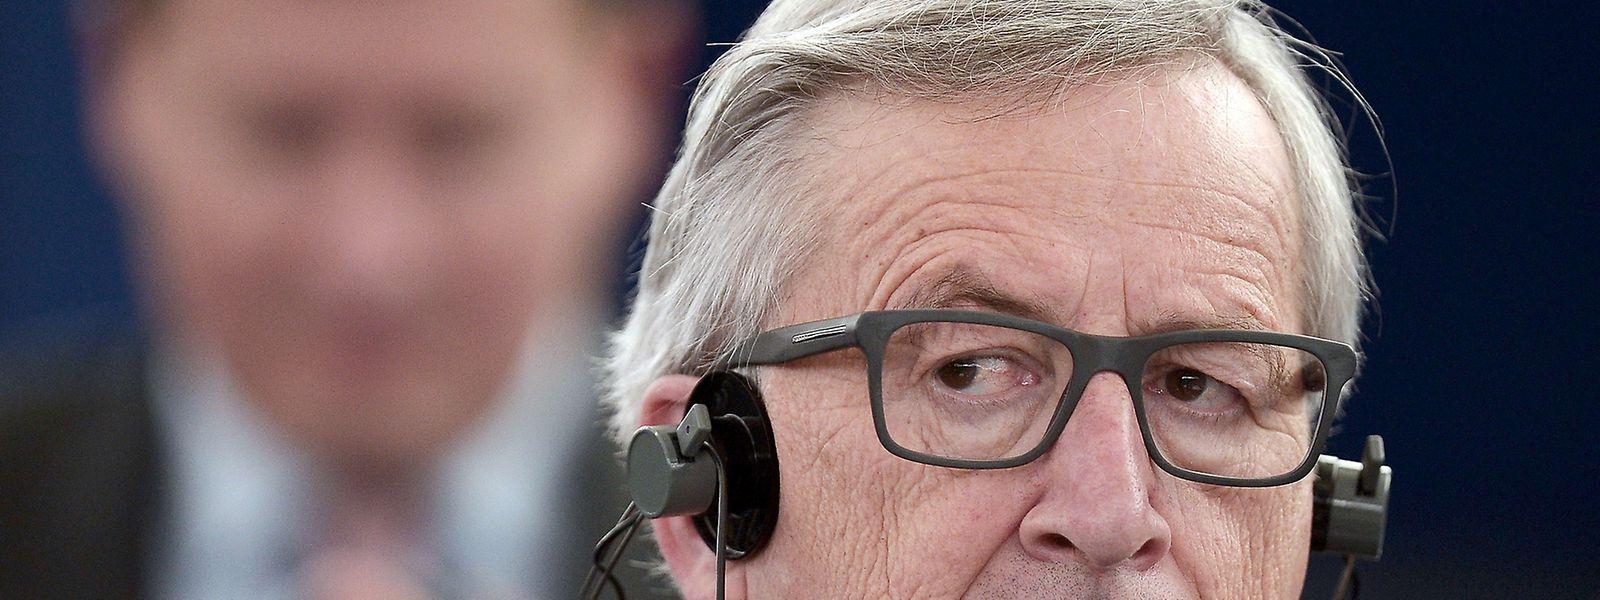 Jean-Claude Juncker au Parlement européen, mercredi 29 avril